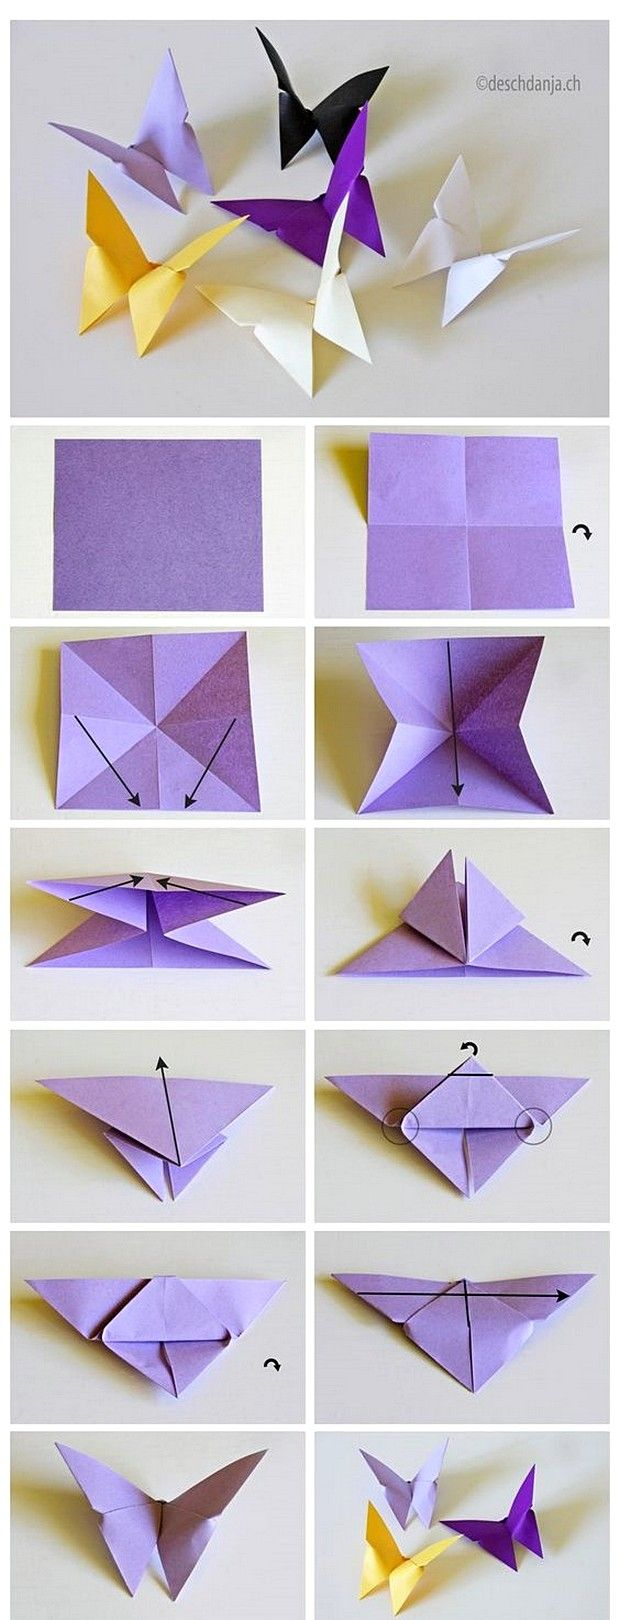 Cara Membuat Hiasan Dinding Dari Kertas Origami : membuat, hiasan, dinding, kertas, origami, Tutorial, Lengkap, Membuat, Hiasan, Dinding, Kamar, Buatan, Sendiri, Kertas, Origami, Berbentuk, Cantik, Warna, Warni, Origami,, Kerajinan